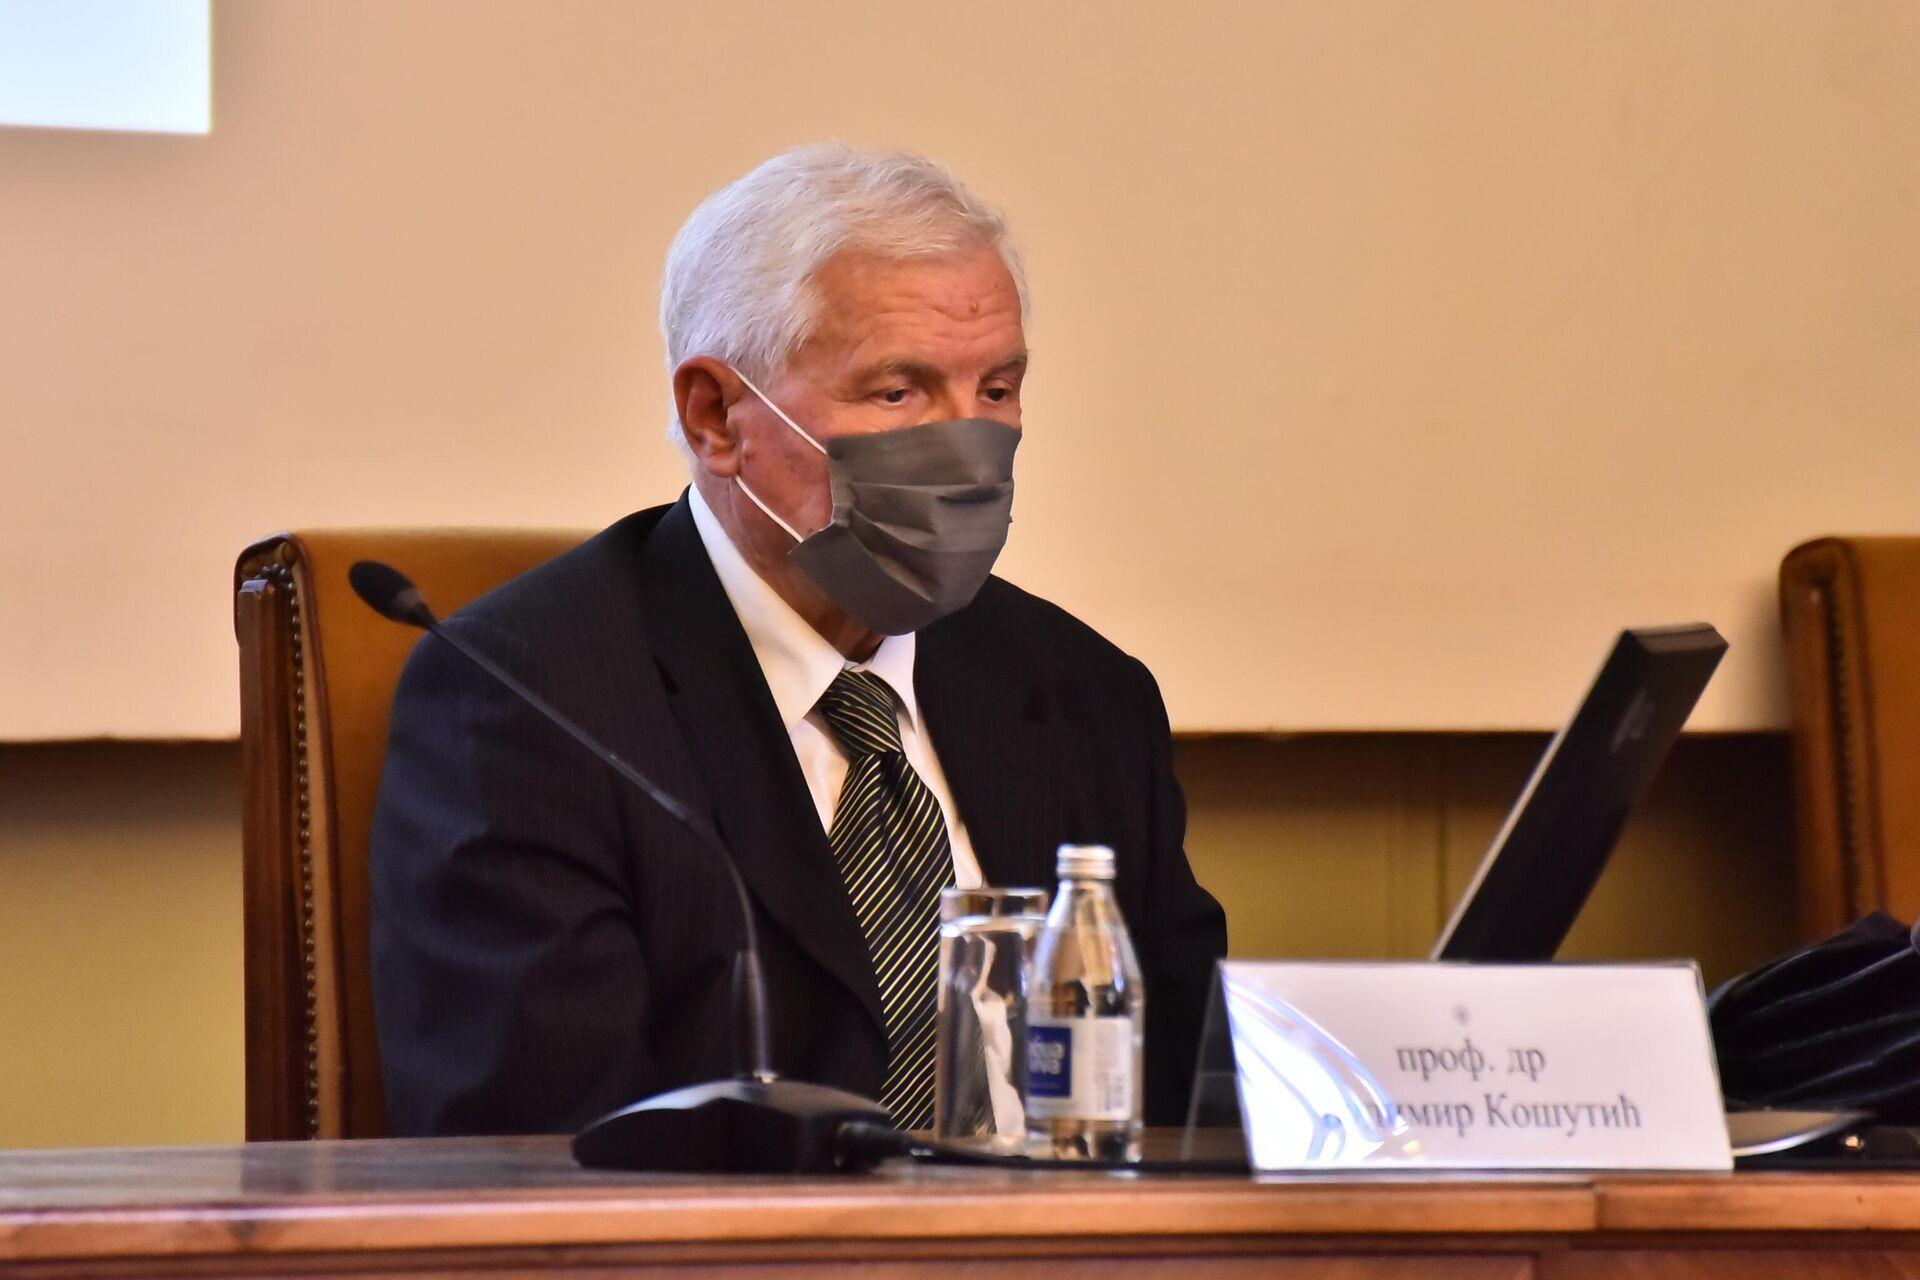 Prof. dr Budimir Košutić - Sputnik Srbija, 1920, 28.09.2021